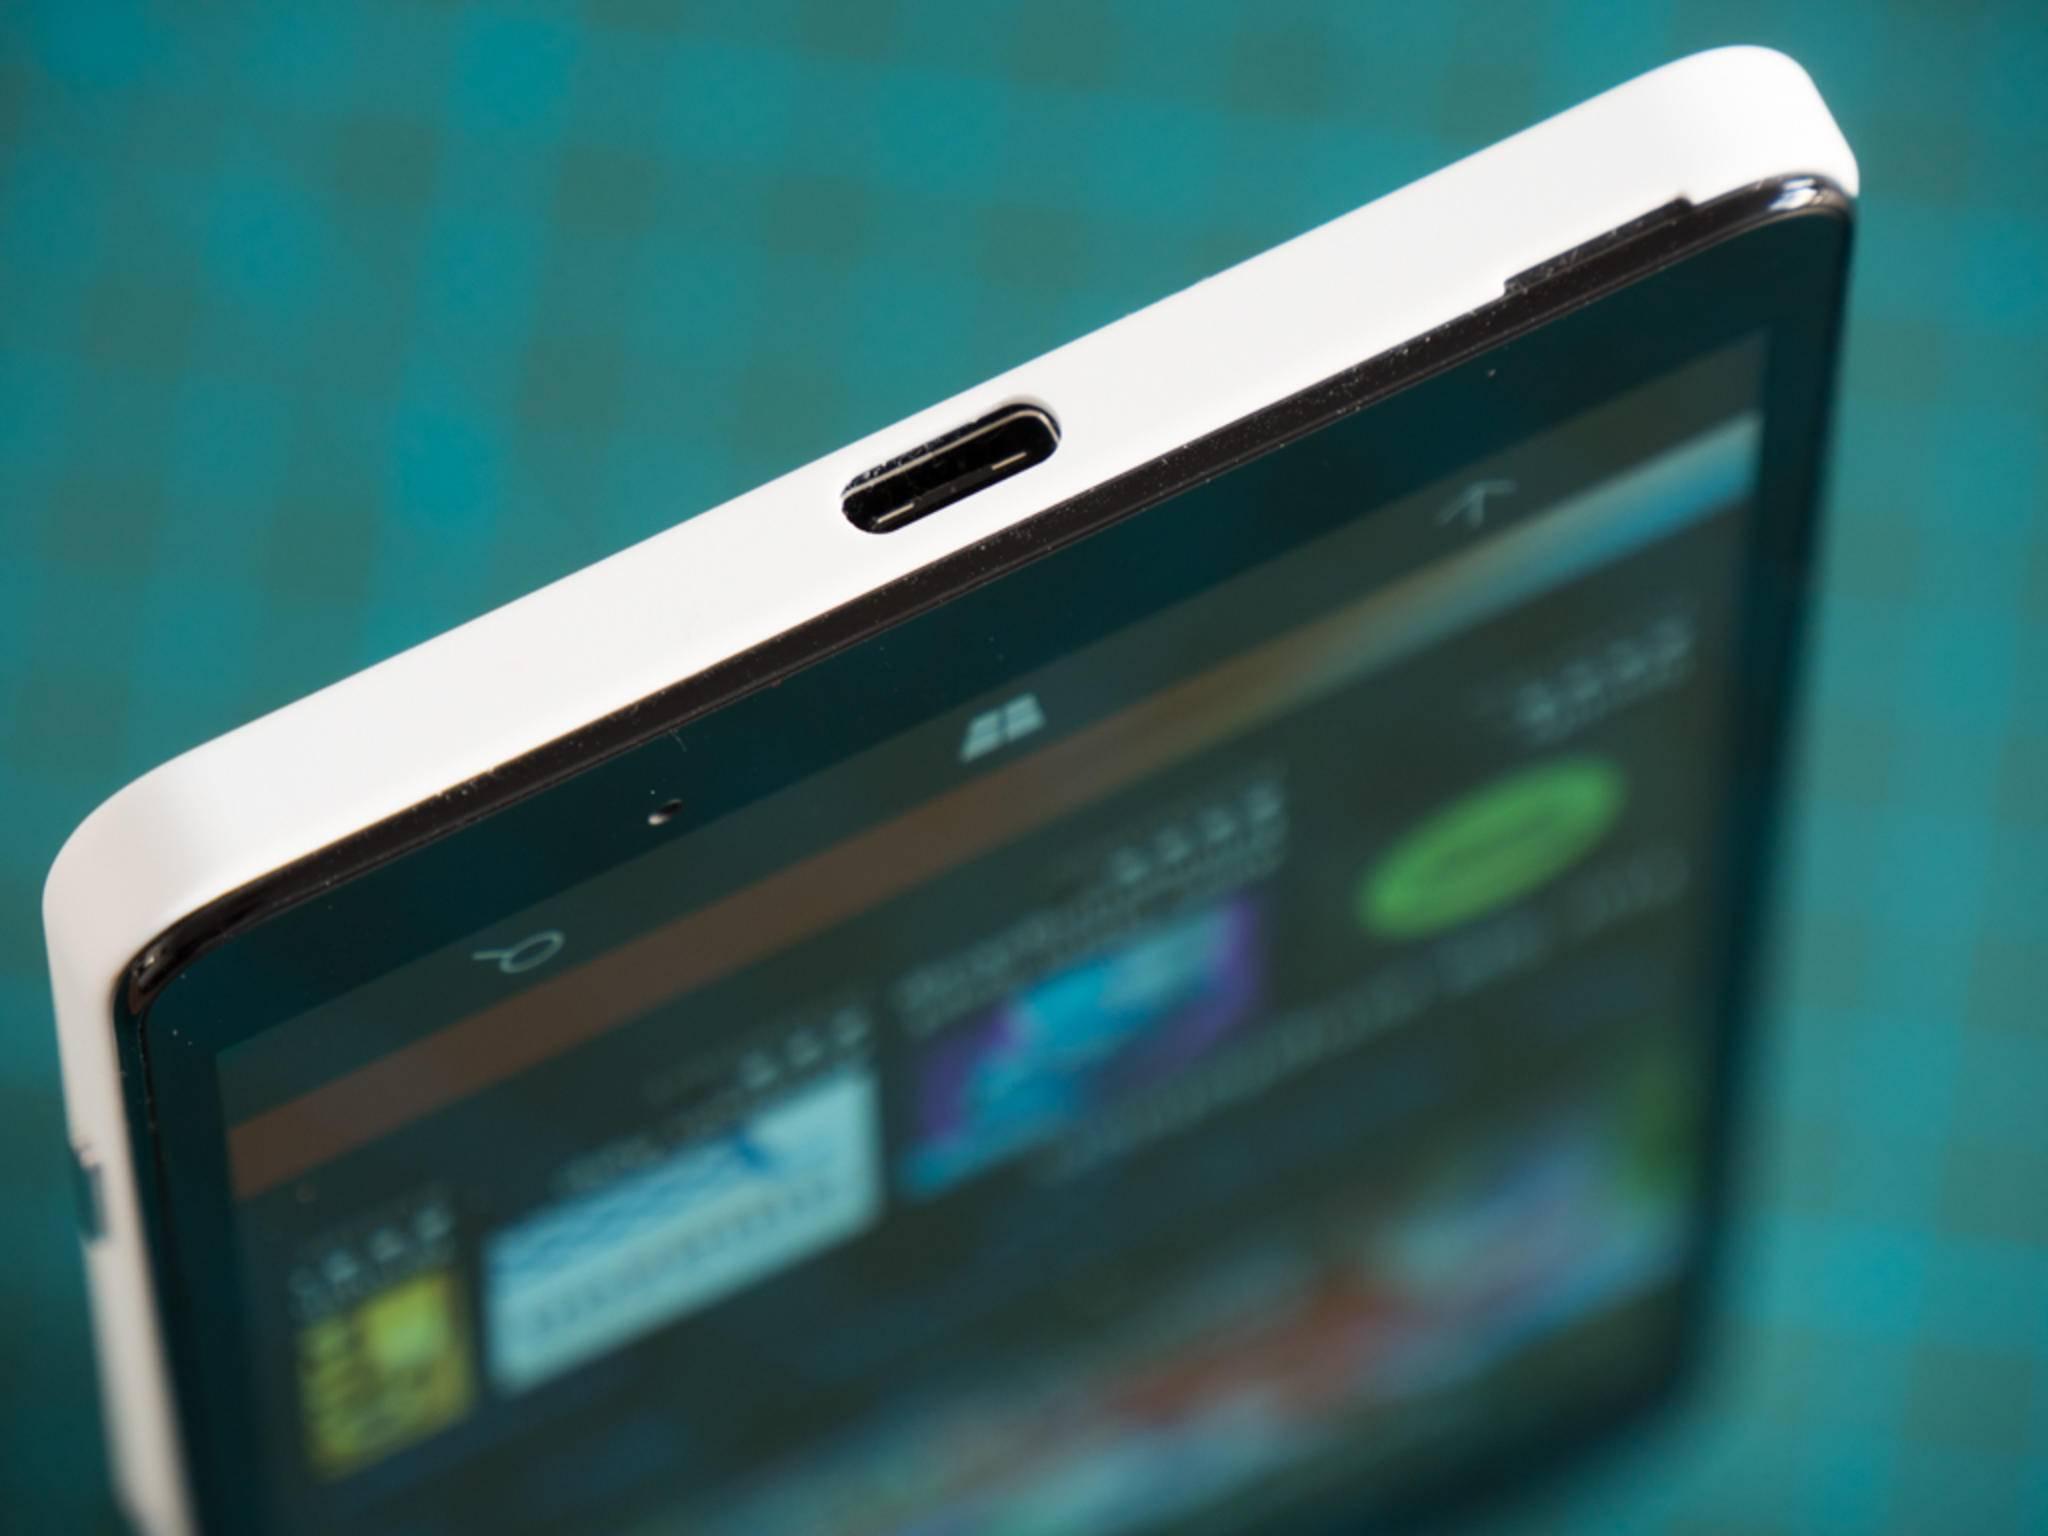 Das Display-Dock wird am USB Type-C-Port angeschlossen.